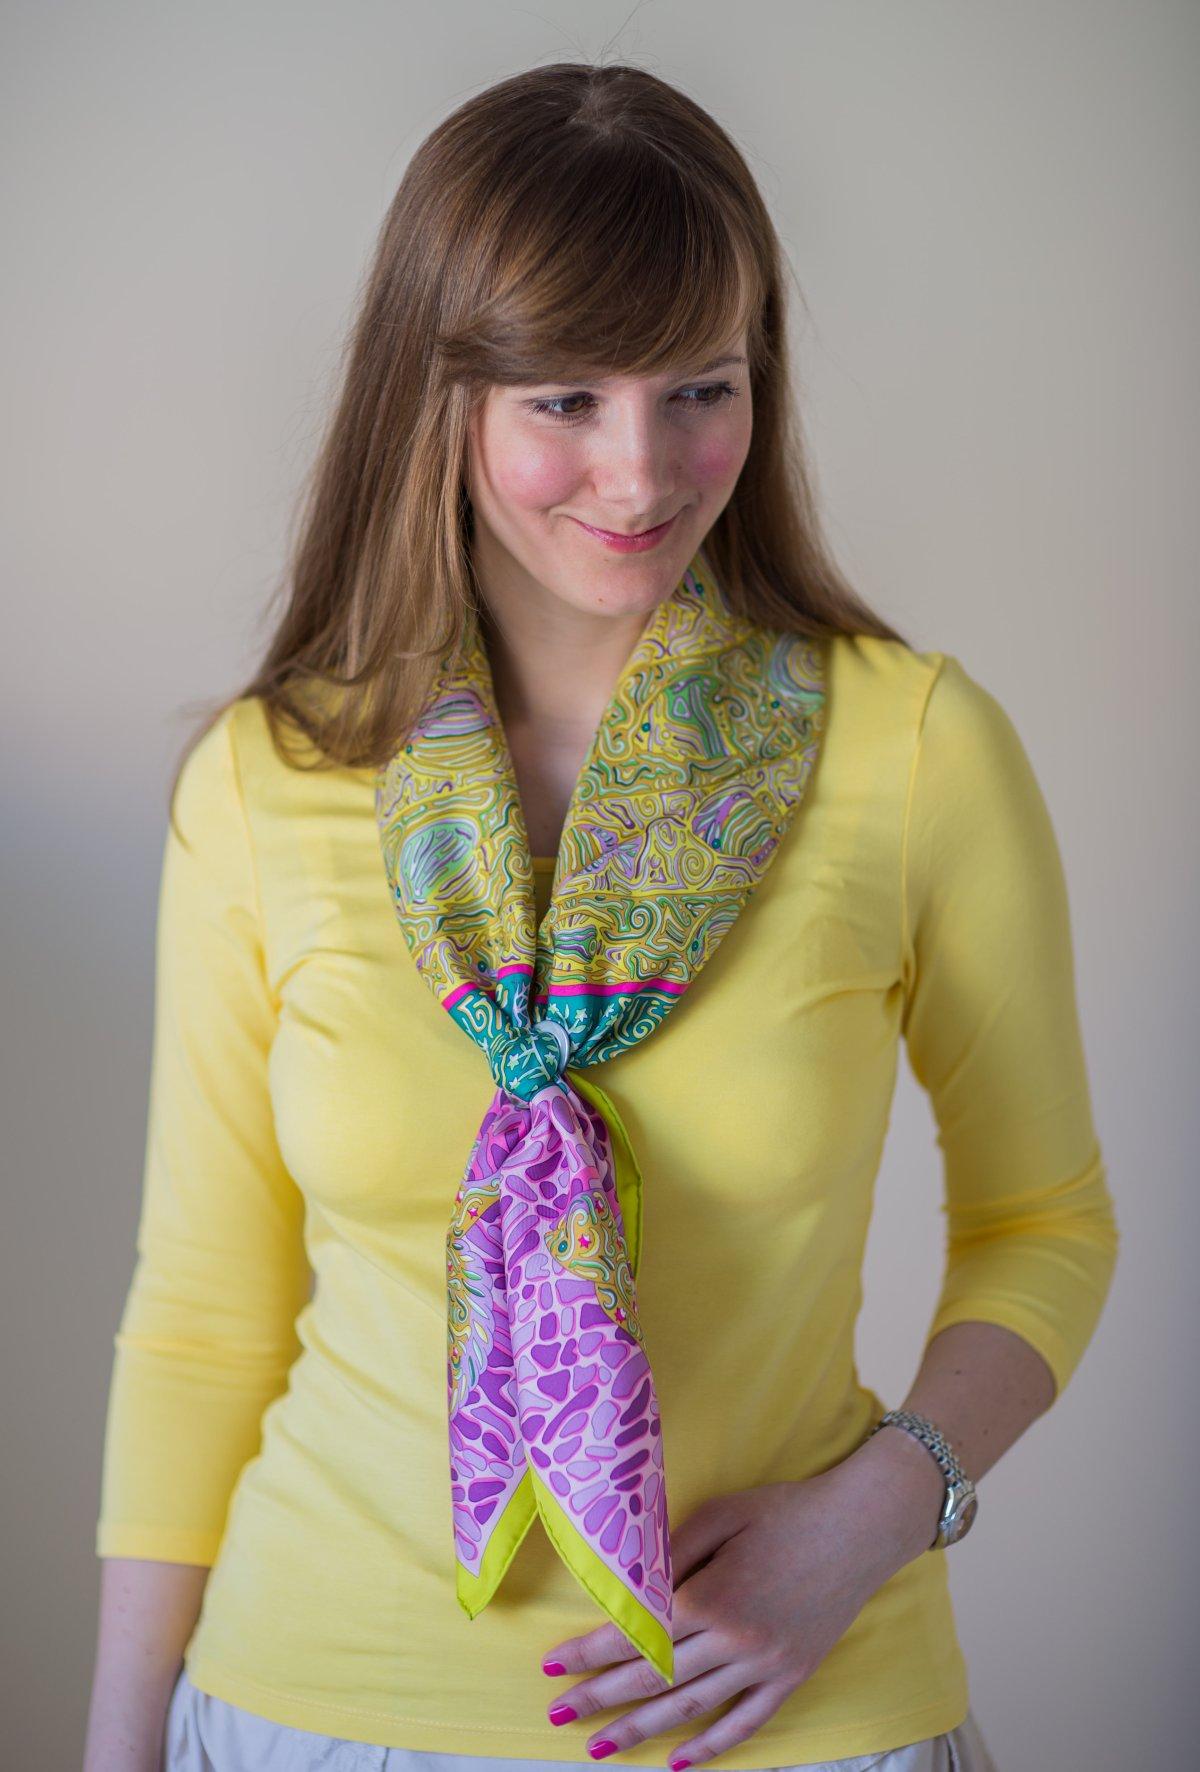 la legende du poisson corail, hermes scarf, knot, knots, knotting, эрмес, платок, карре, как красиво завязать платок